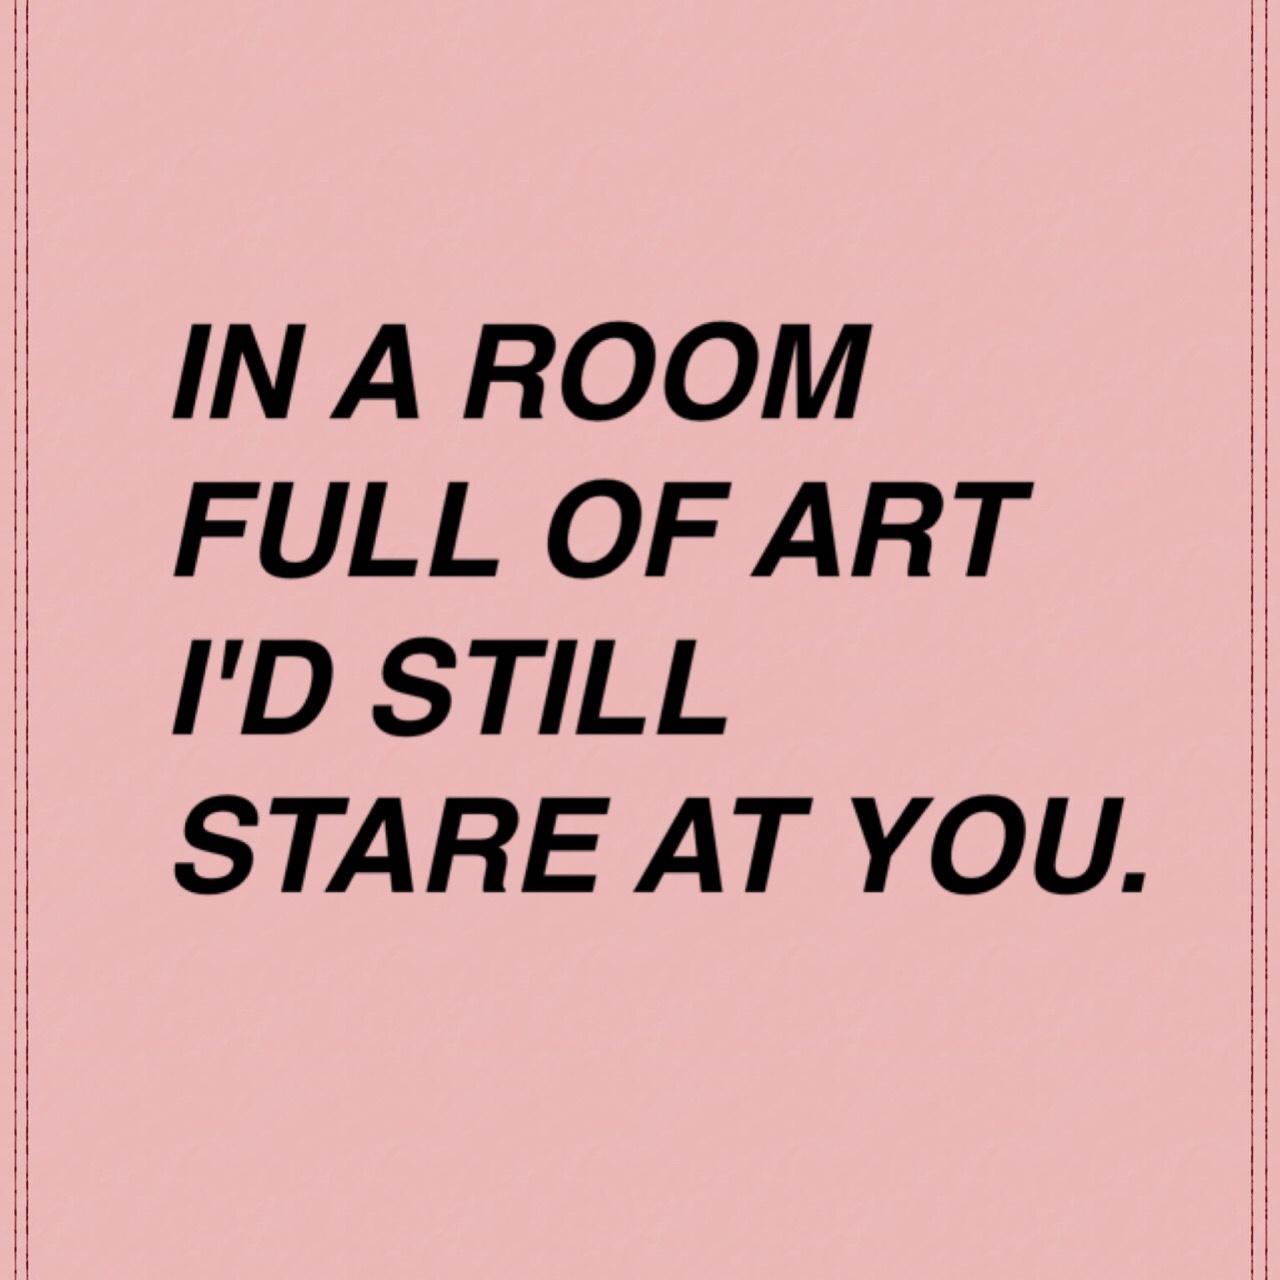 #ArtBasel babe